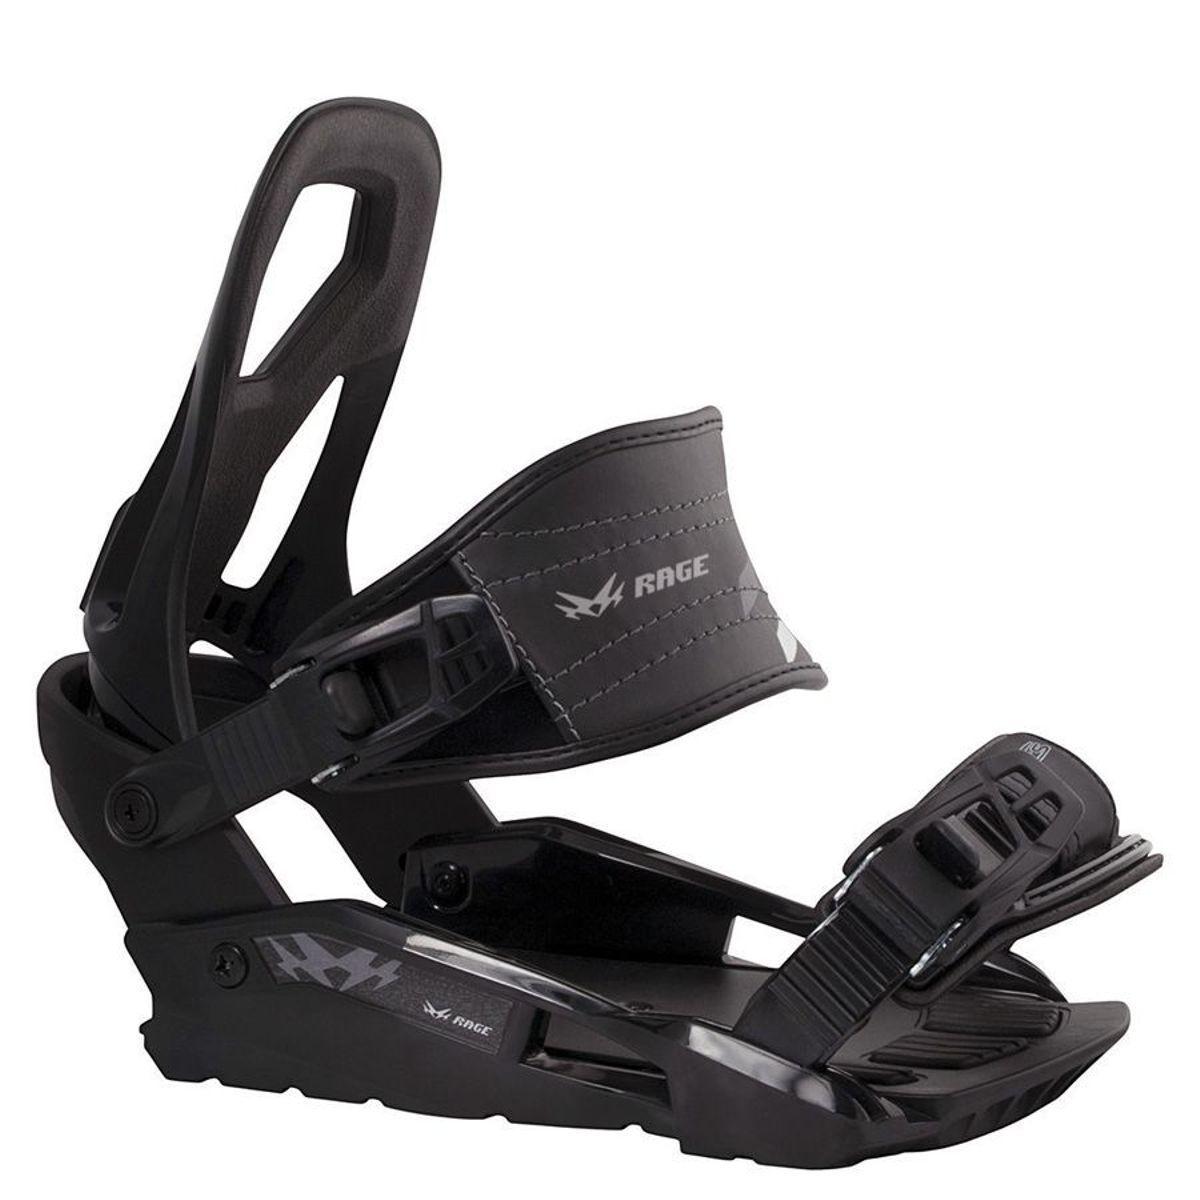 Maffia F50 Snowboard Bindung SP RX 540 Gr. S M für Boots Gr. 38 - 42 black